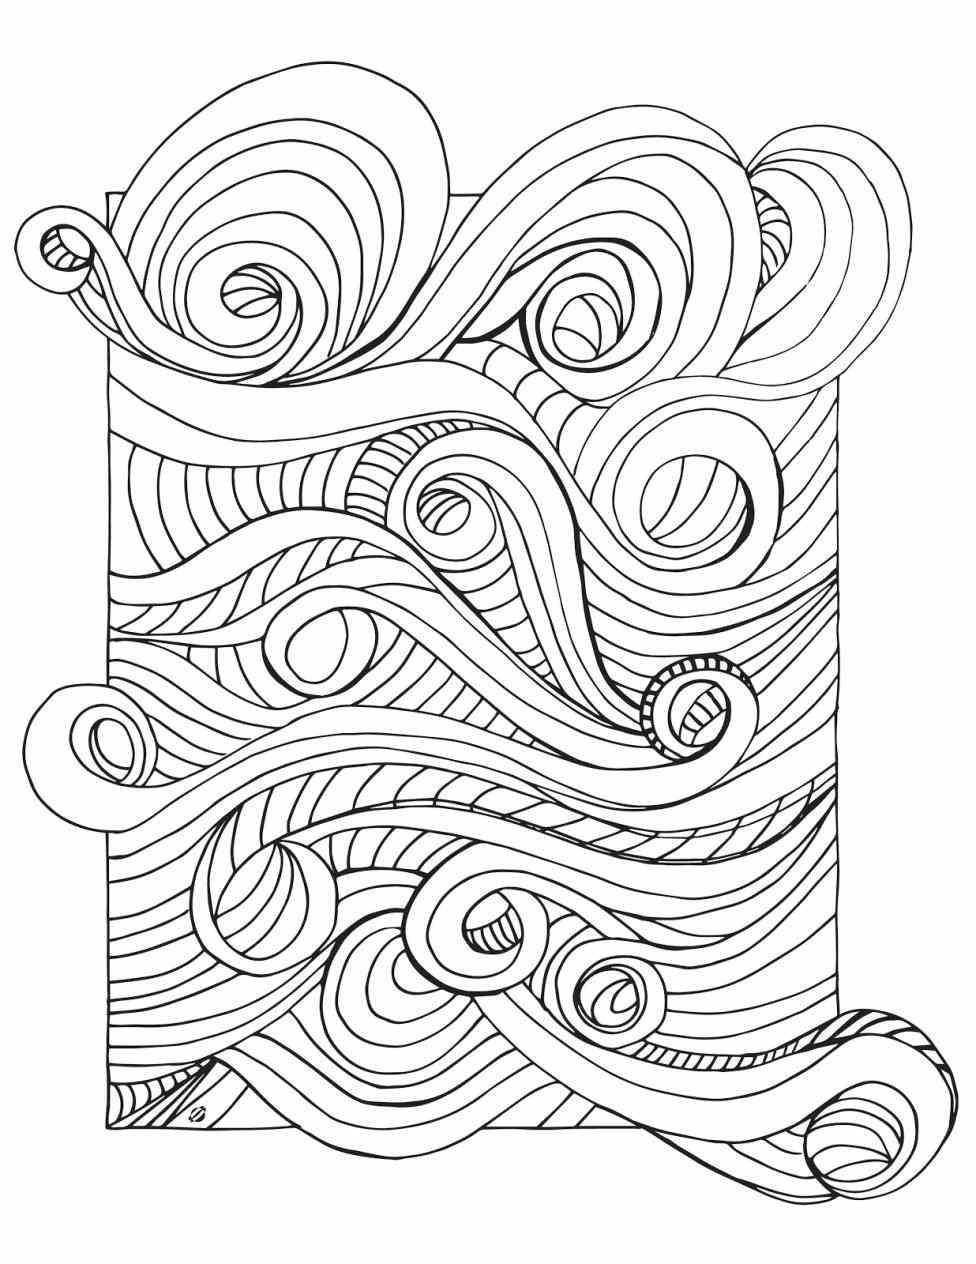 Printable ocean wave coloring pages ~ Ocean Waves Drawing at GetDrawings.com | Free for personal ...